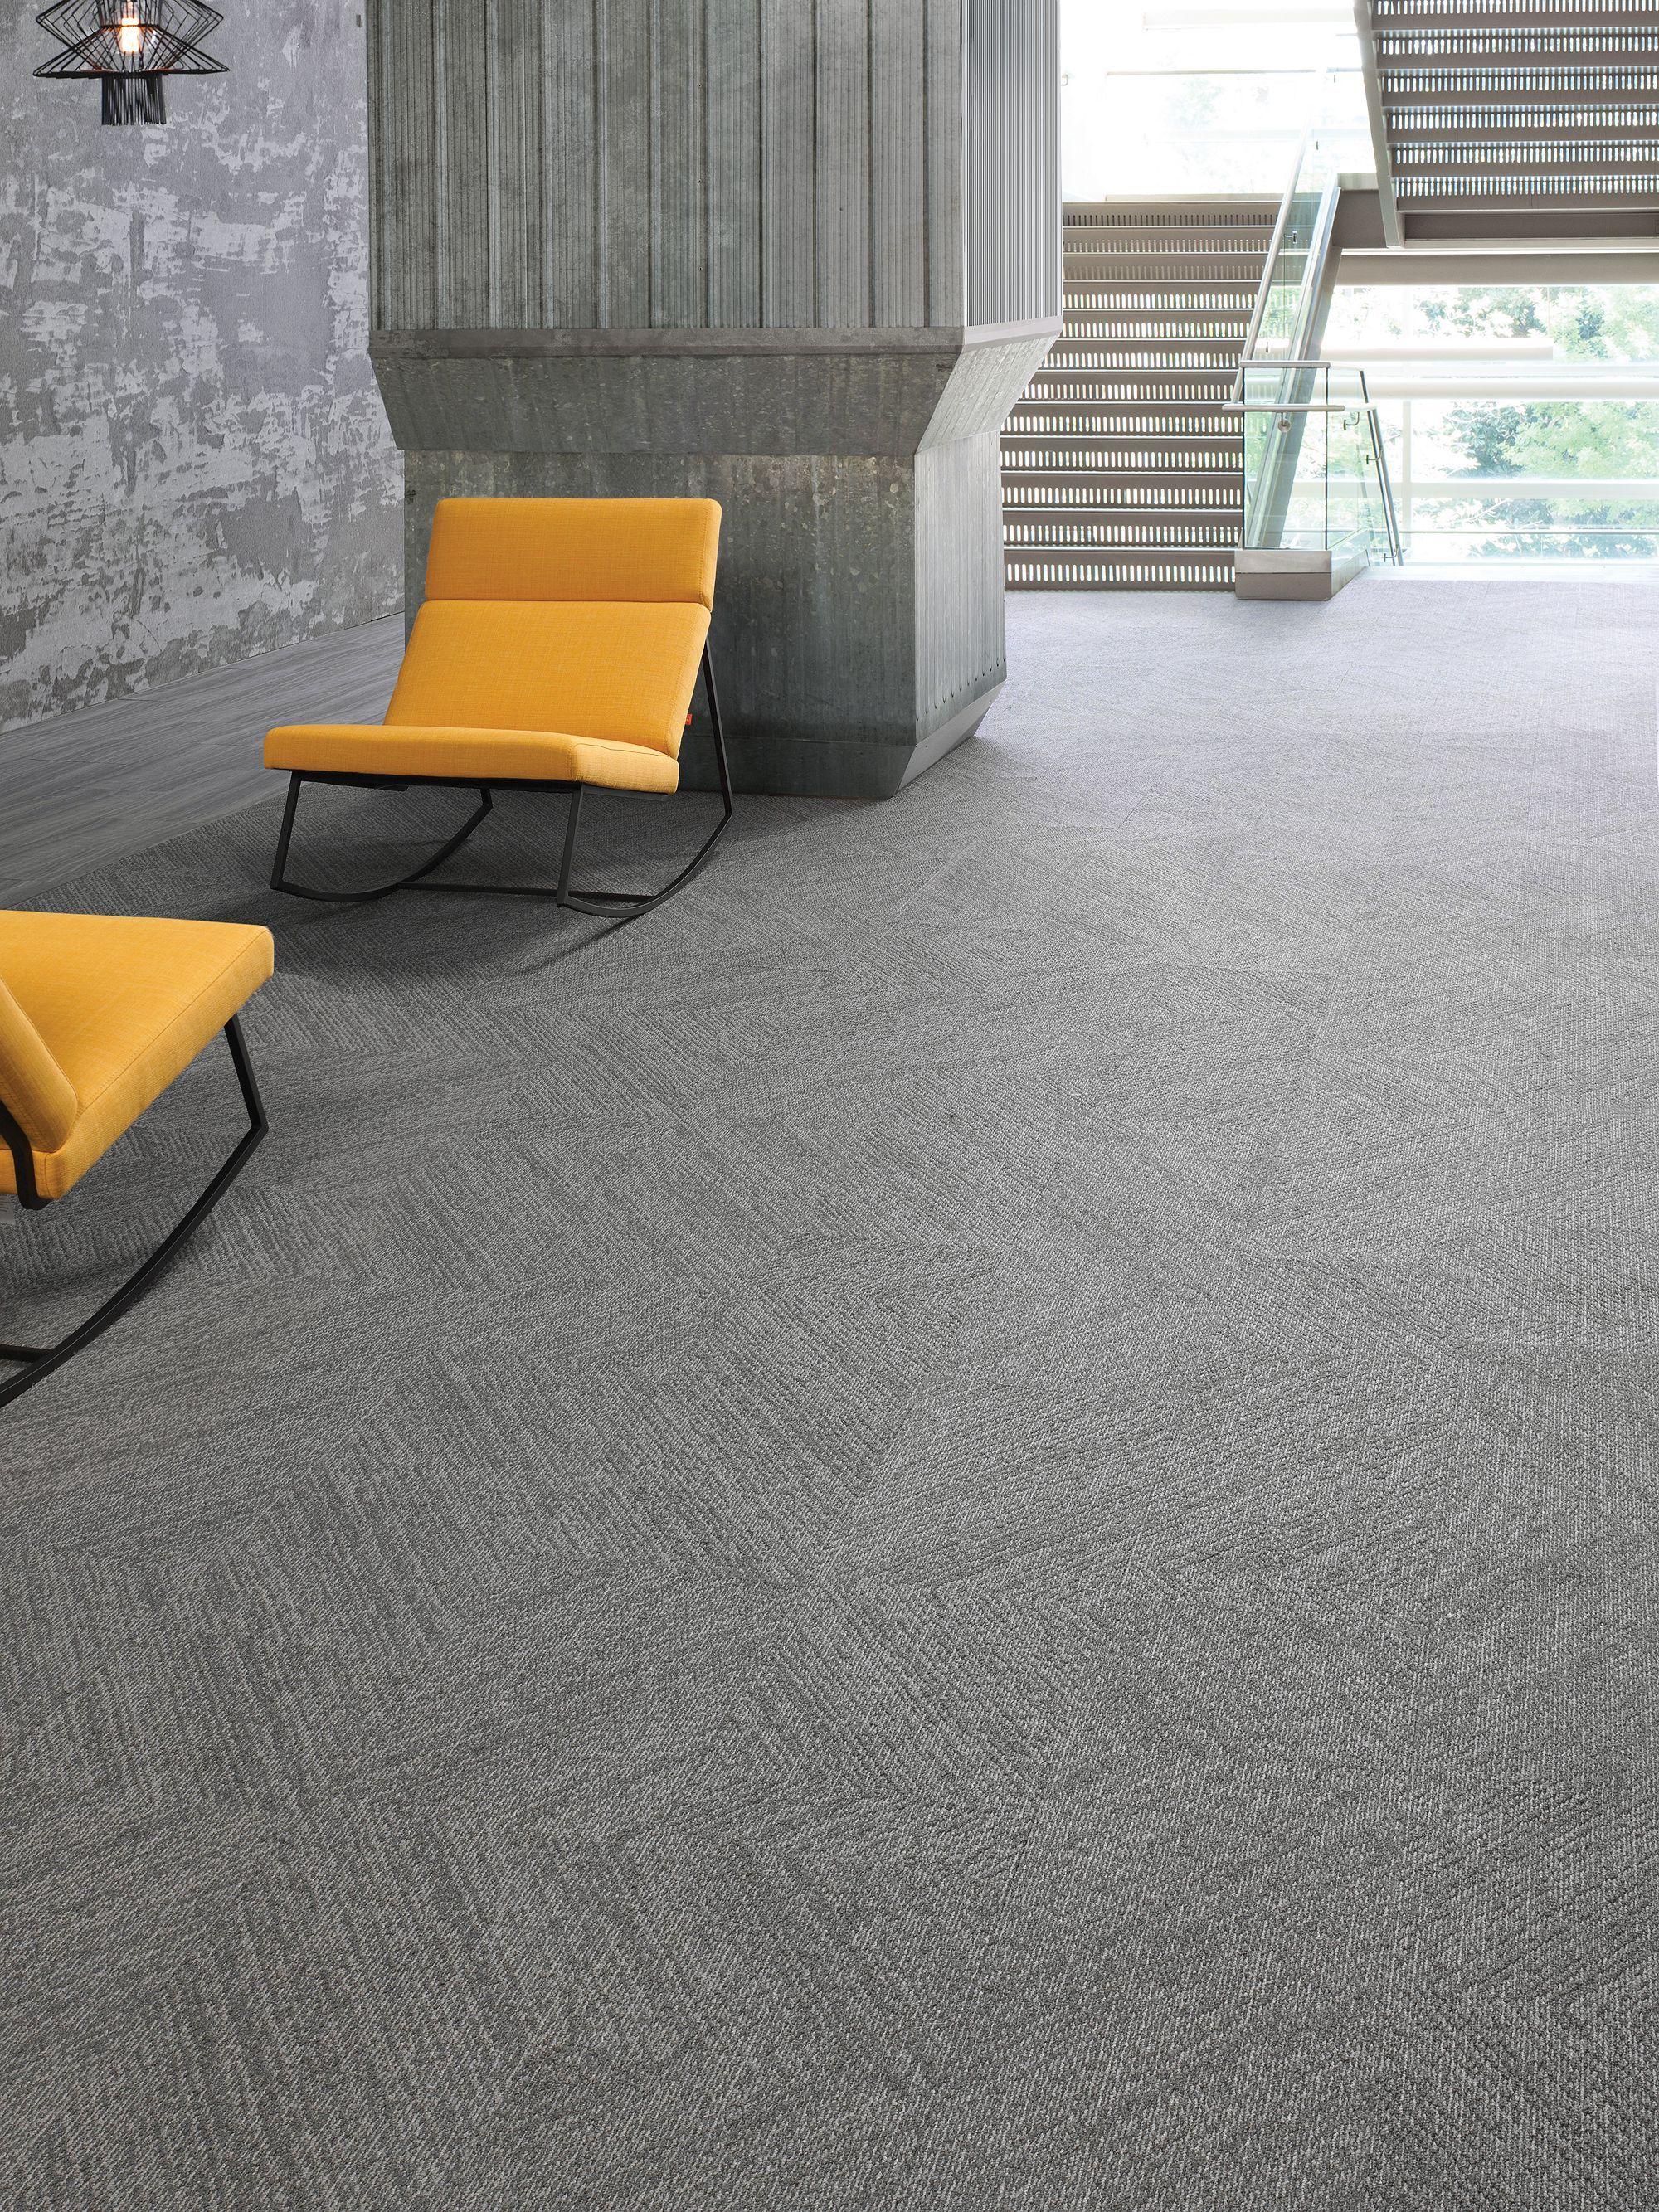 Broadloom Carpet Cost Images